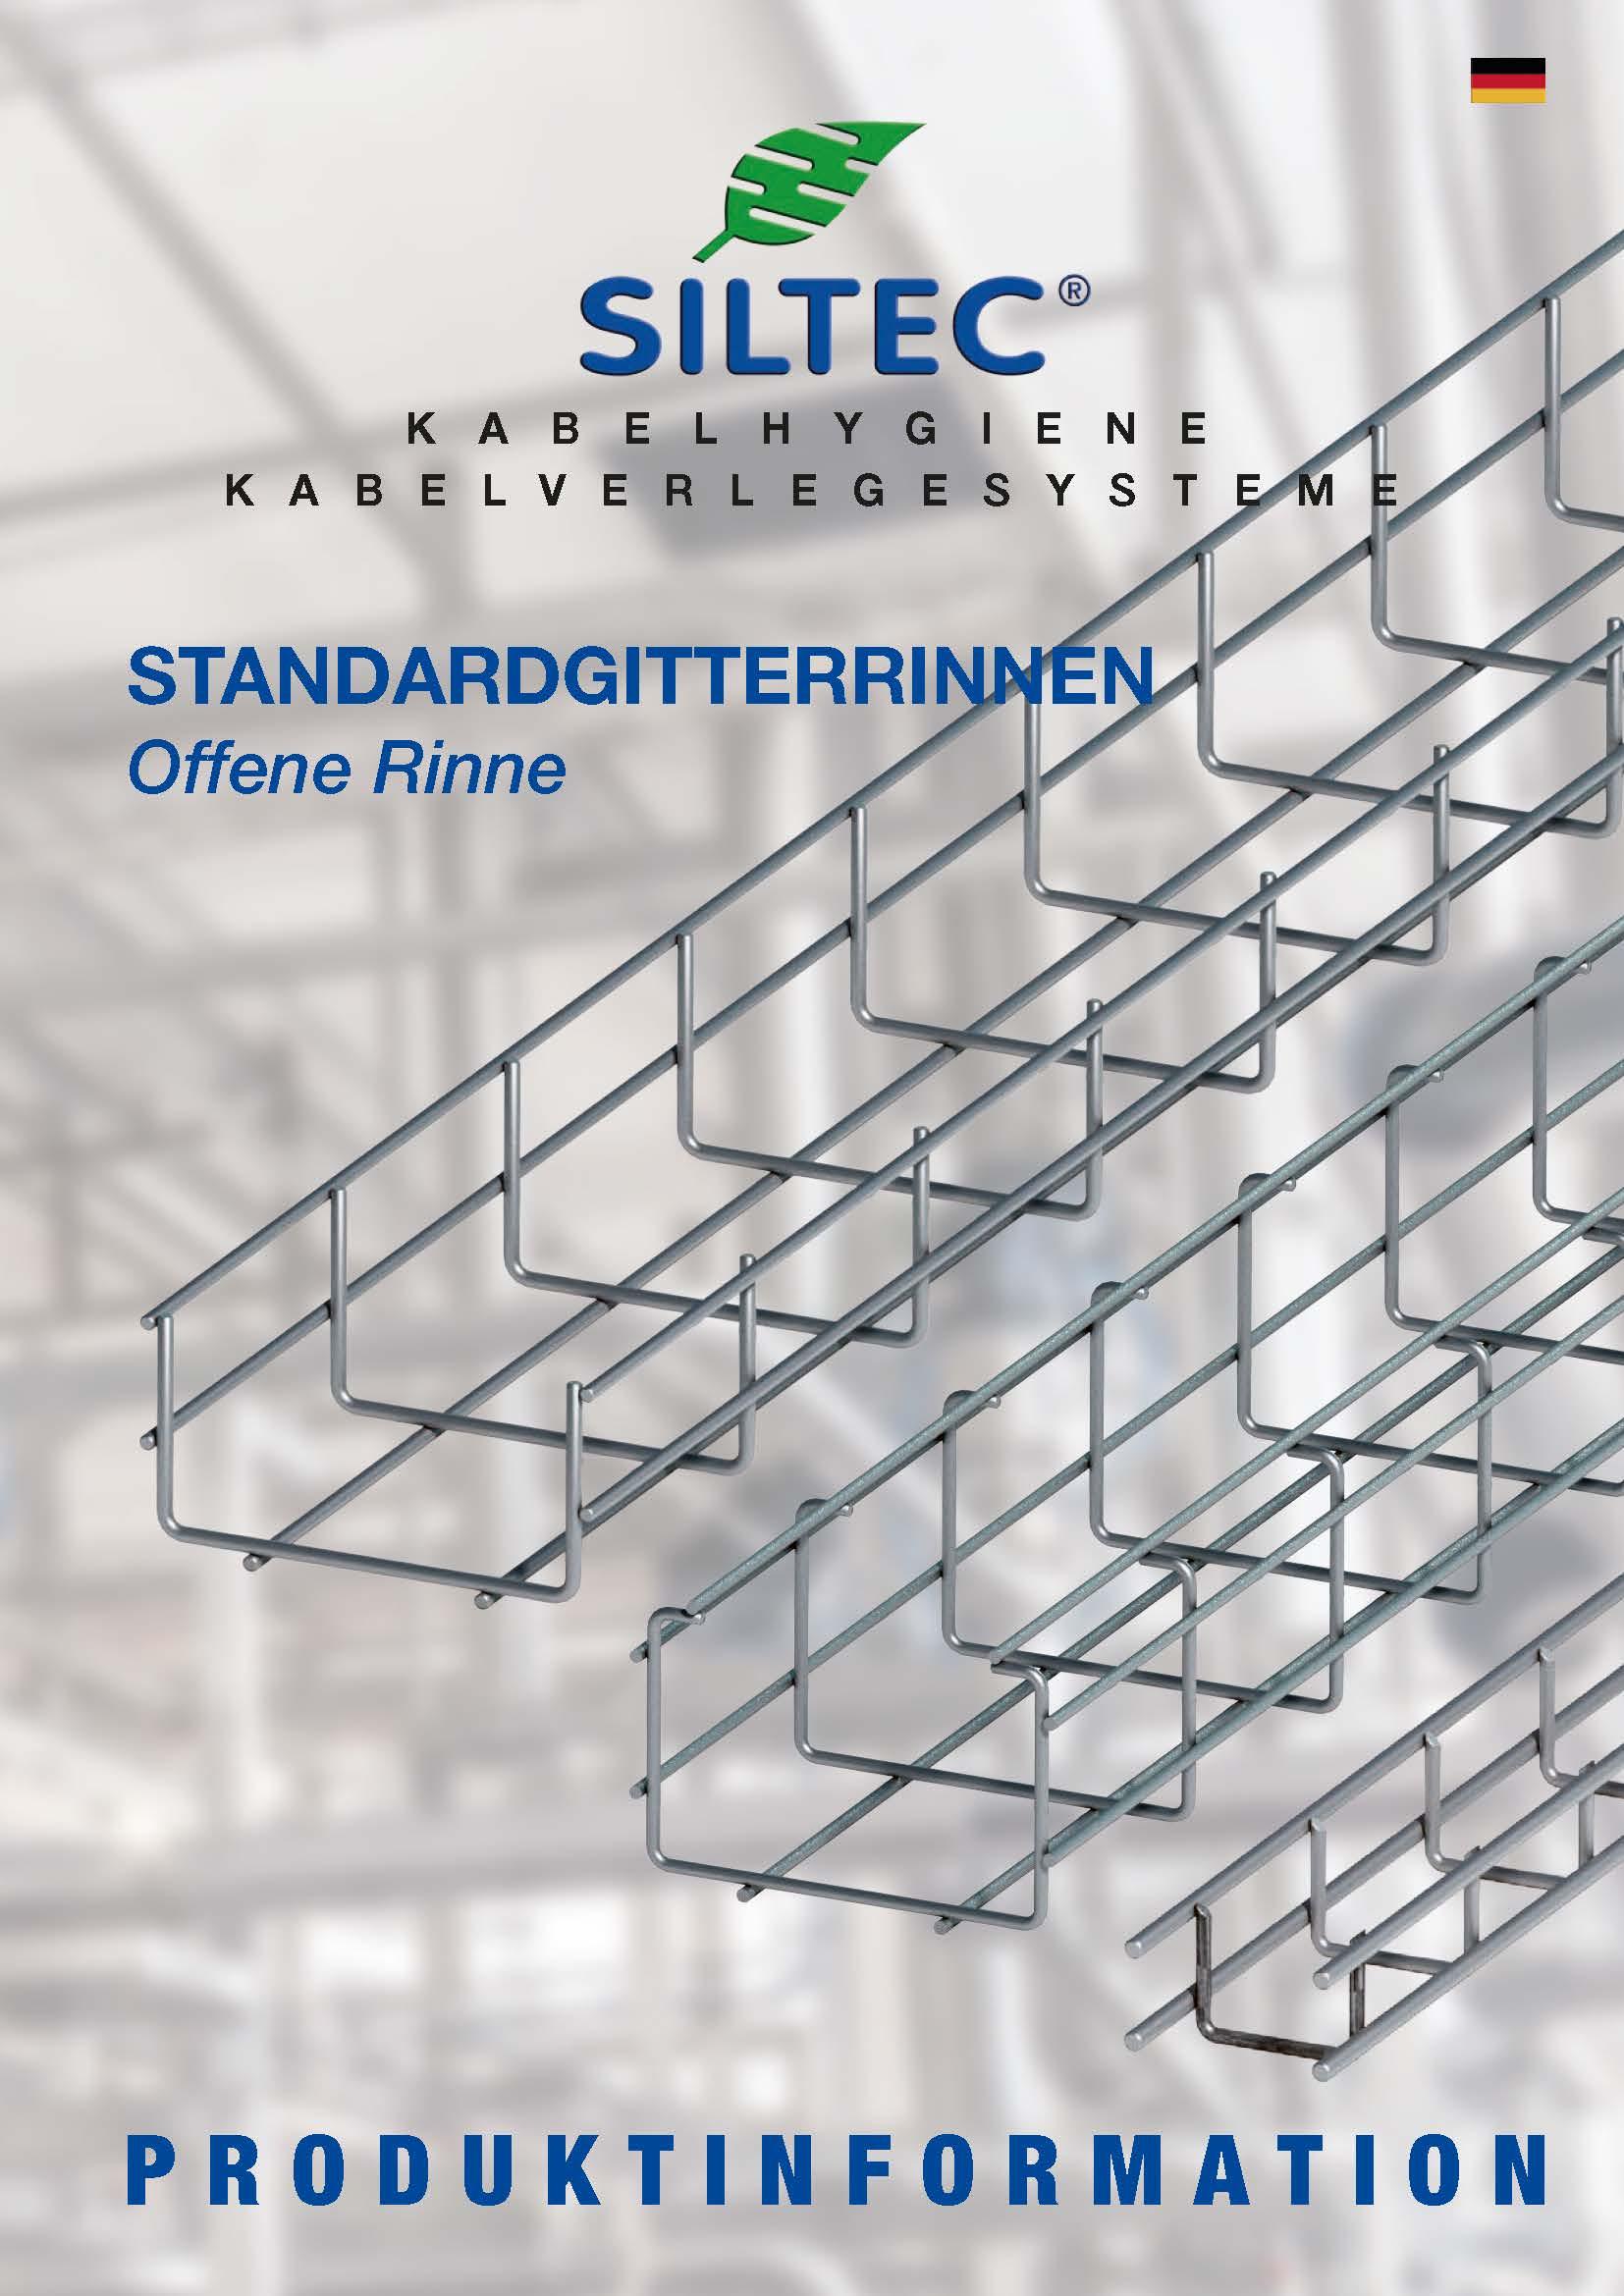 STANDARDGITTERRINNEN-OFFENE-DE_Seite_01